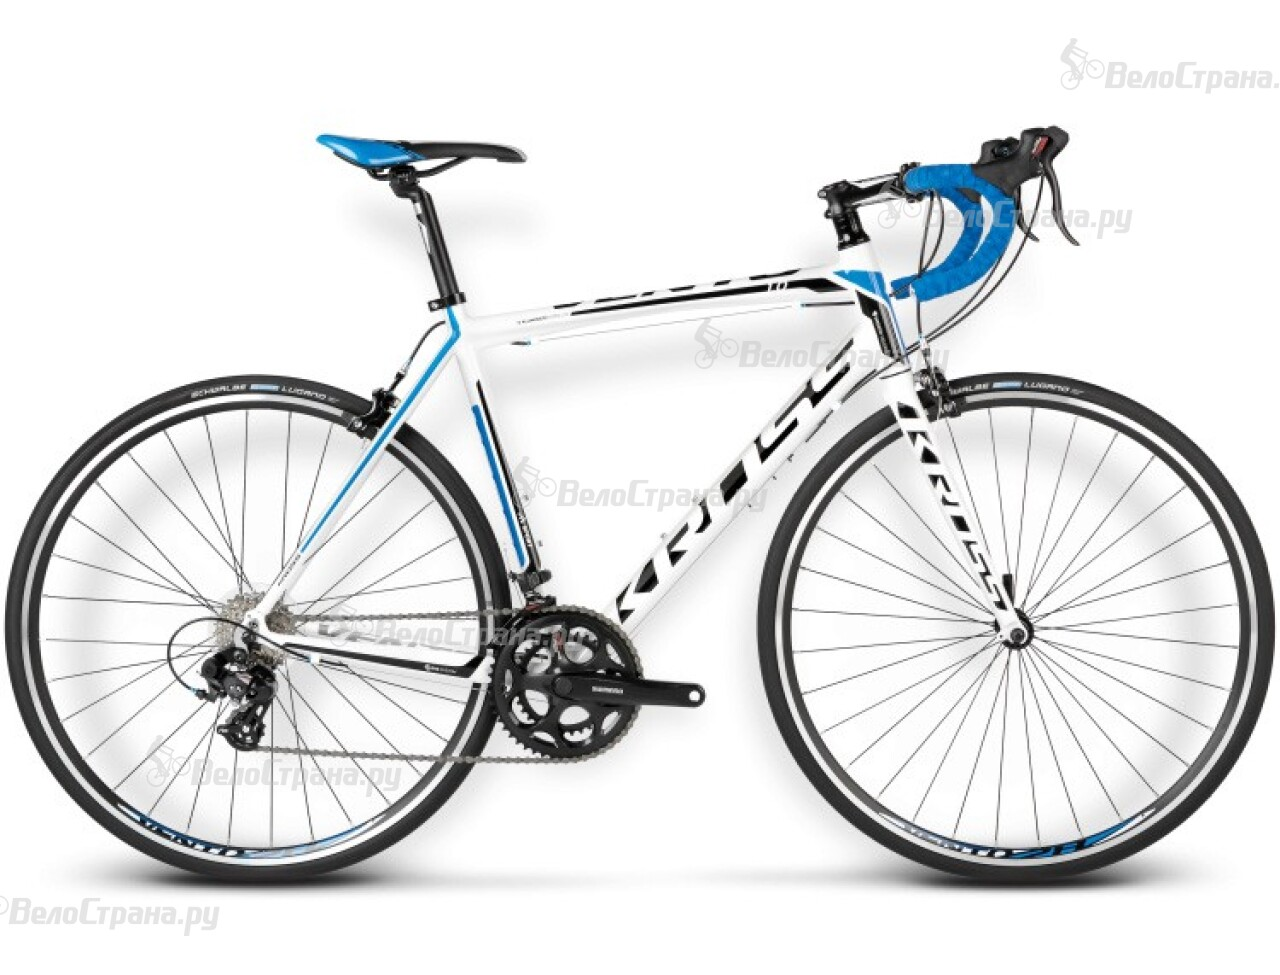 Велосипед Kross VENTO 1.0 (2016) велосипед kross inzai 2016